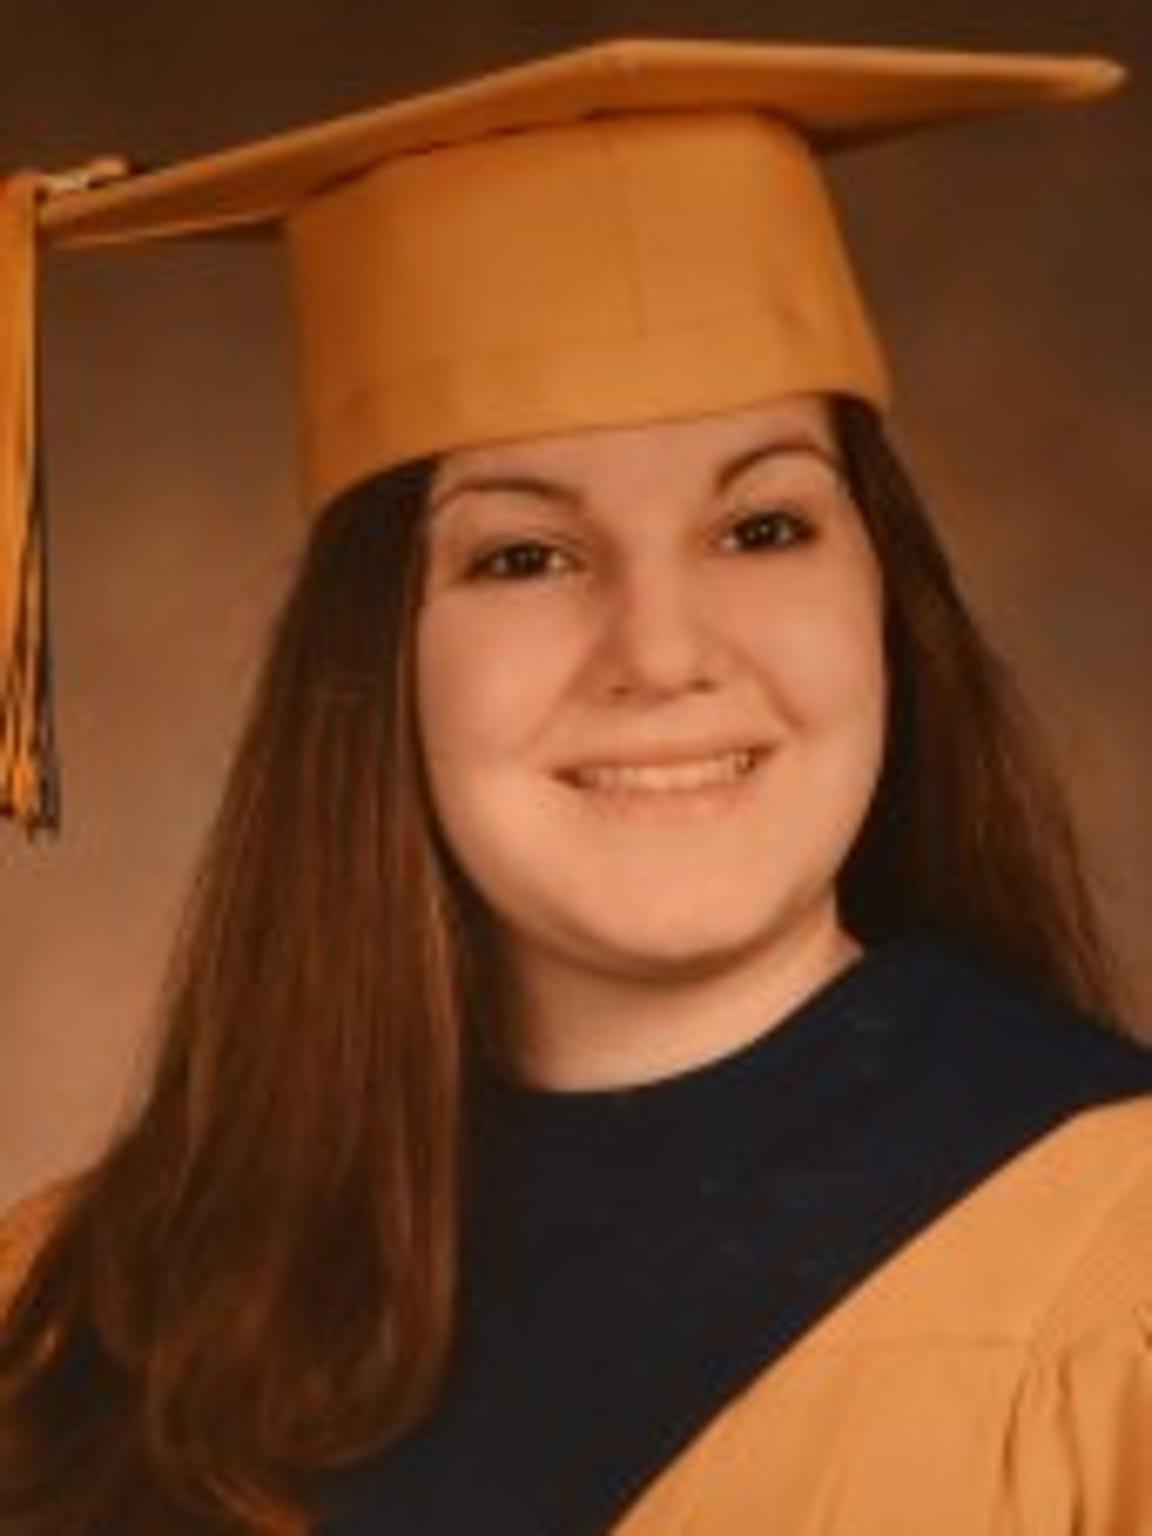 The body of Jody Rilee-Wilson, a 2003 Roxbury High